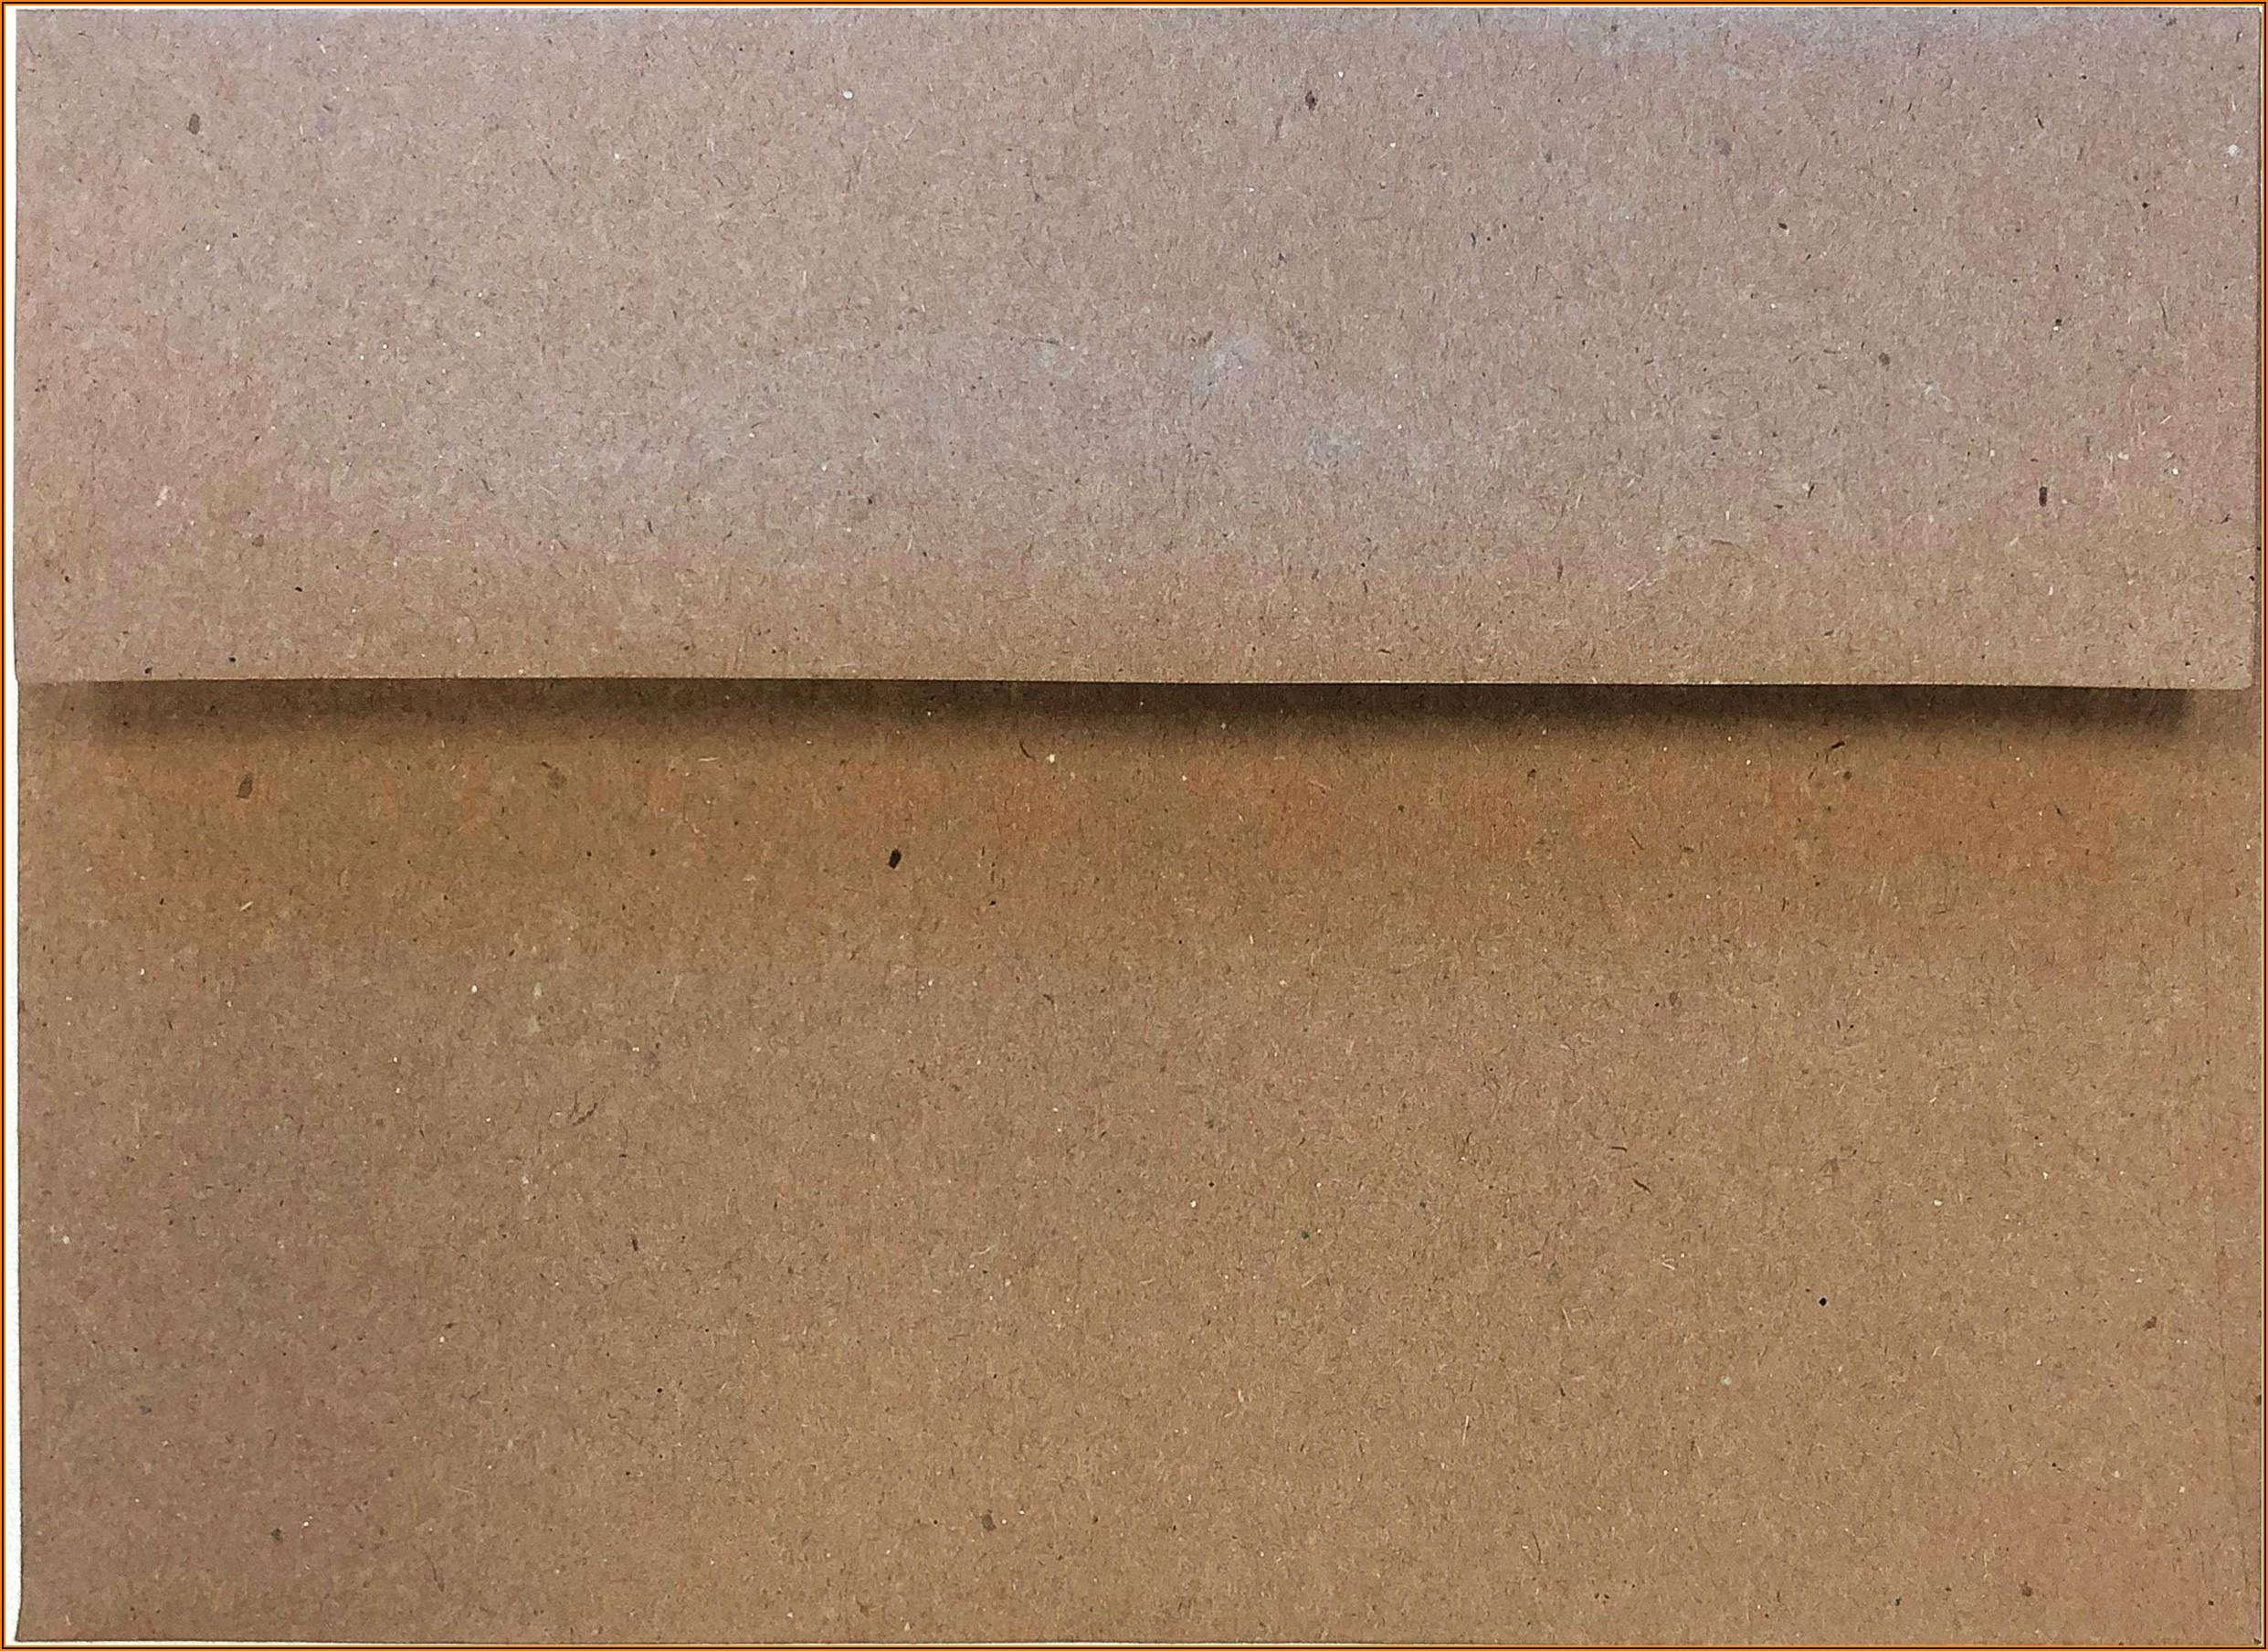 4 X 7 Envelopes